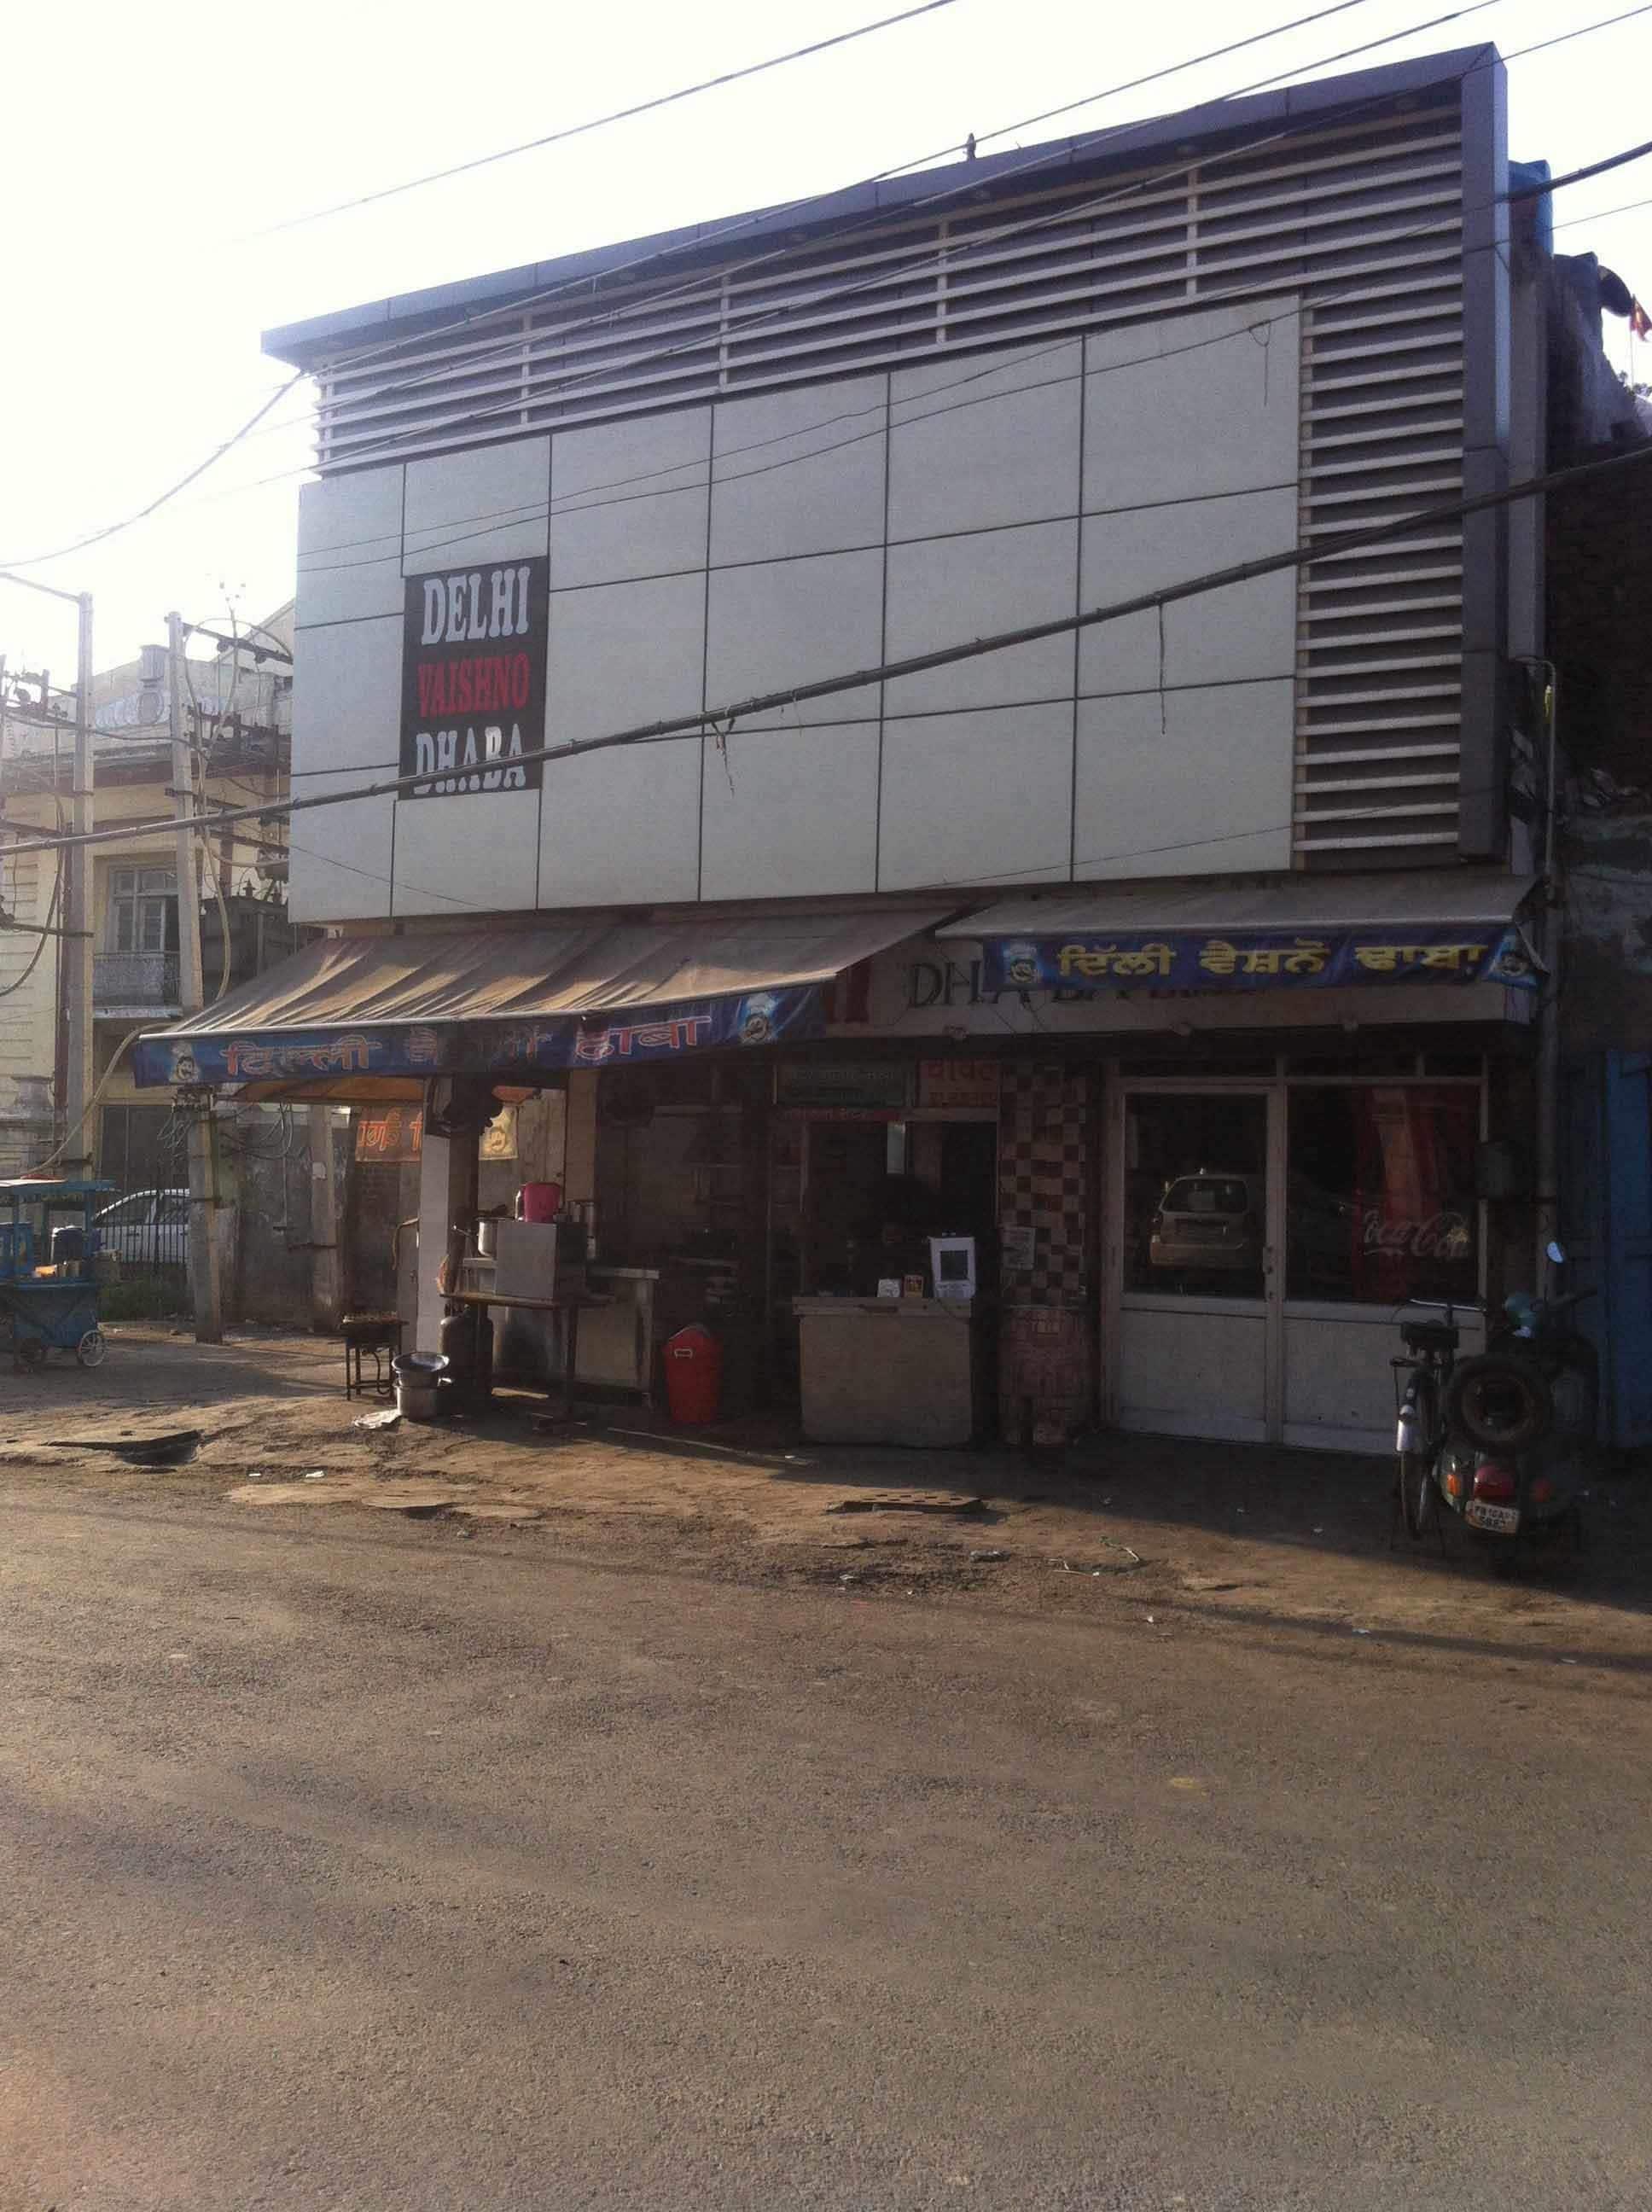 Delhi Vaishno Dhaba - ludhiana Junction - Ludhiana Image